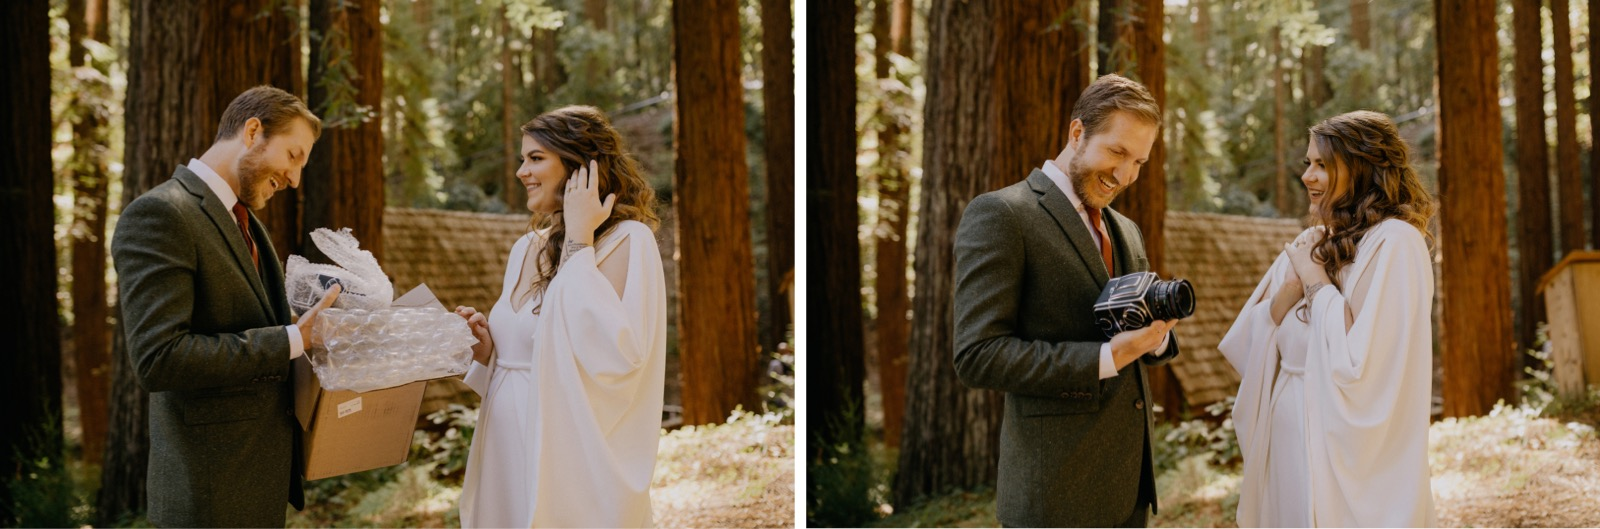 031_Emily & Jeff Wedding 0225_Emily & Jeff Wedding 0222_forest_bride_outdoor_first-look_moments_groom_wedding